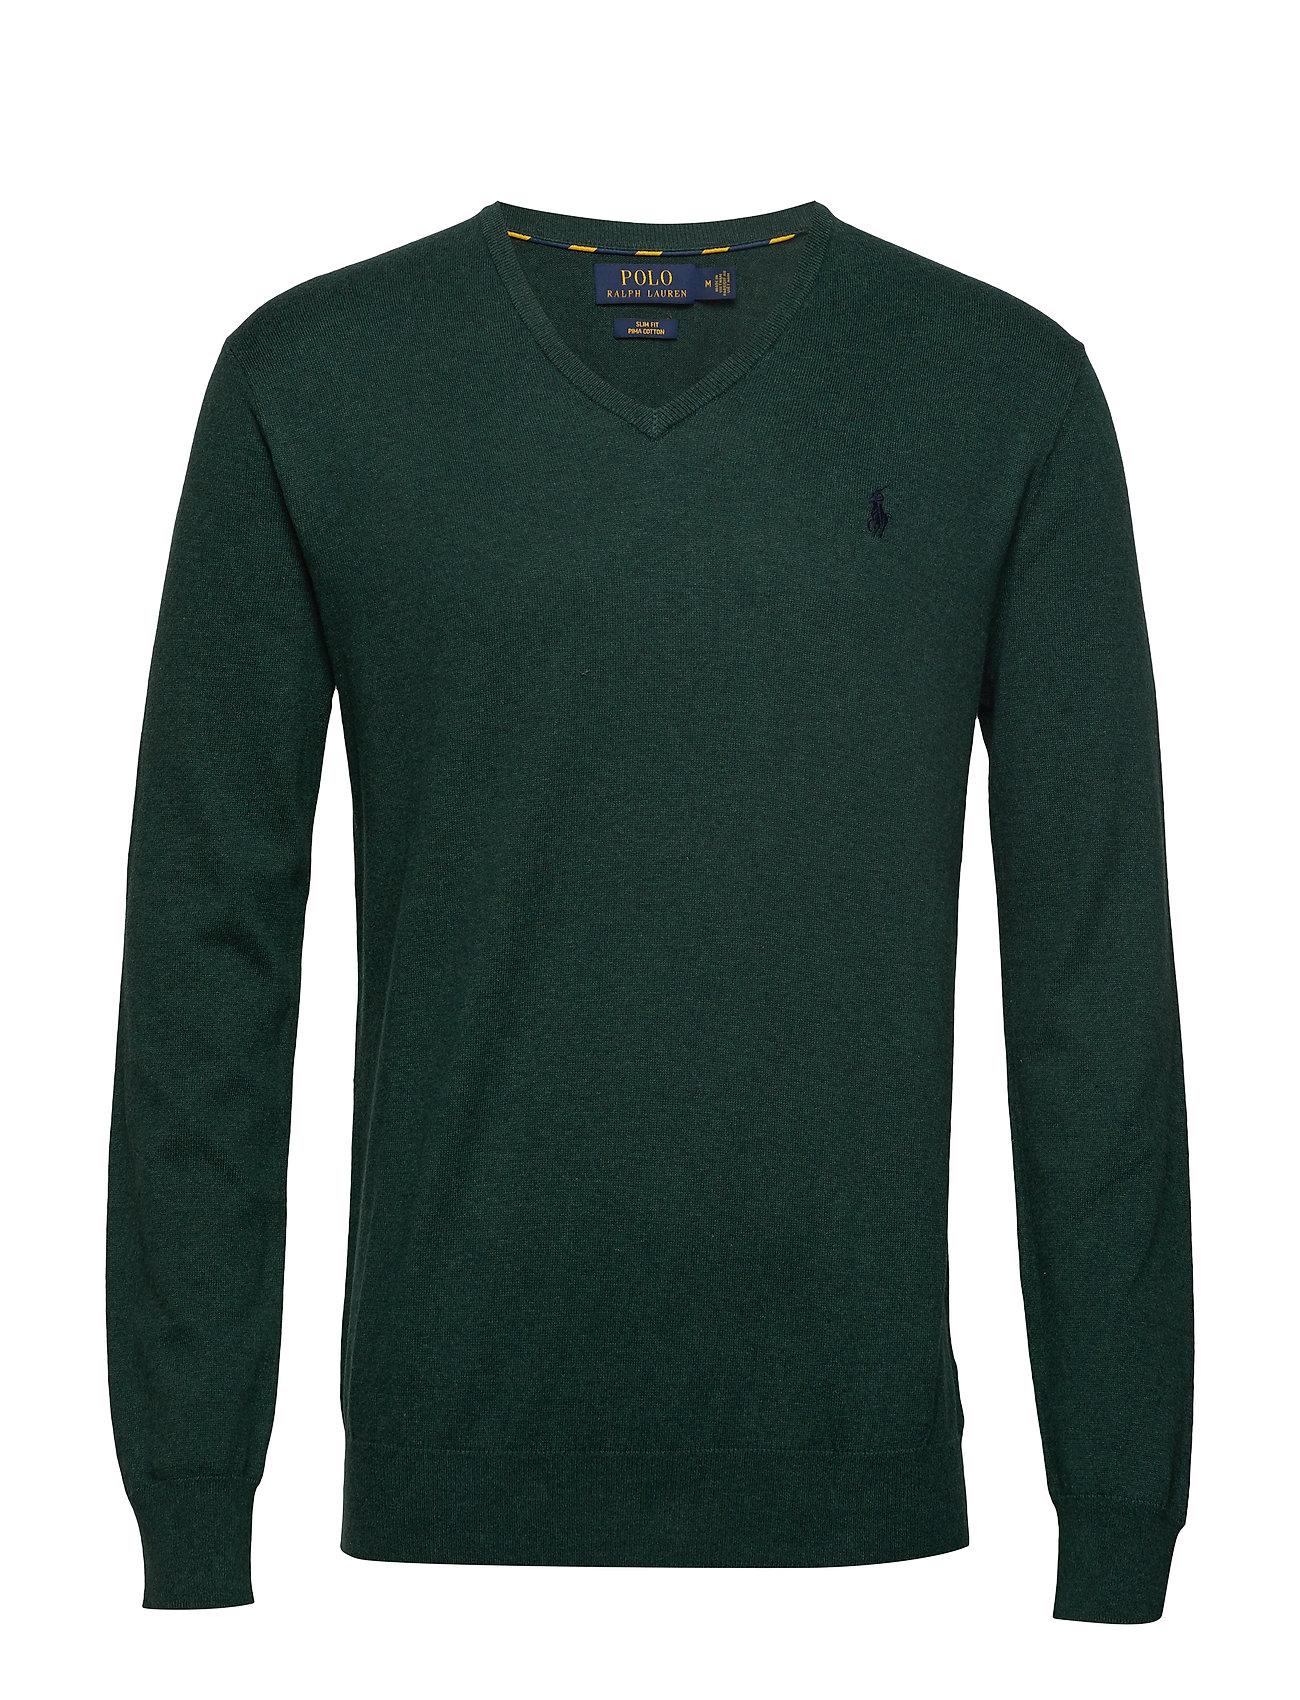 Polo Ralph Lauren Slim Fit Cotton V-Neck Sweater - SCOTCH PINE HEATH